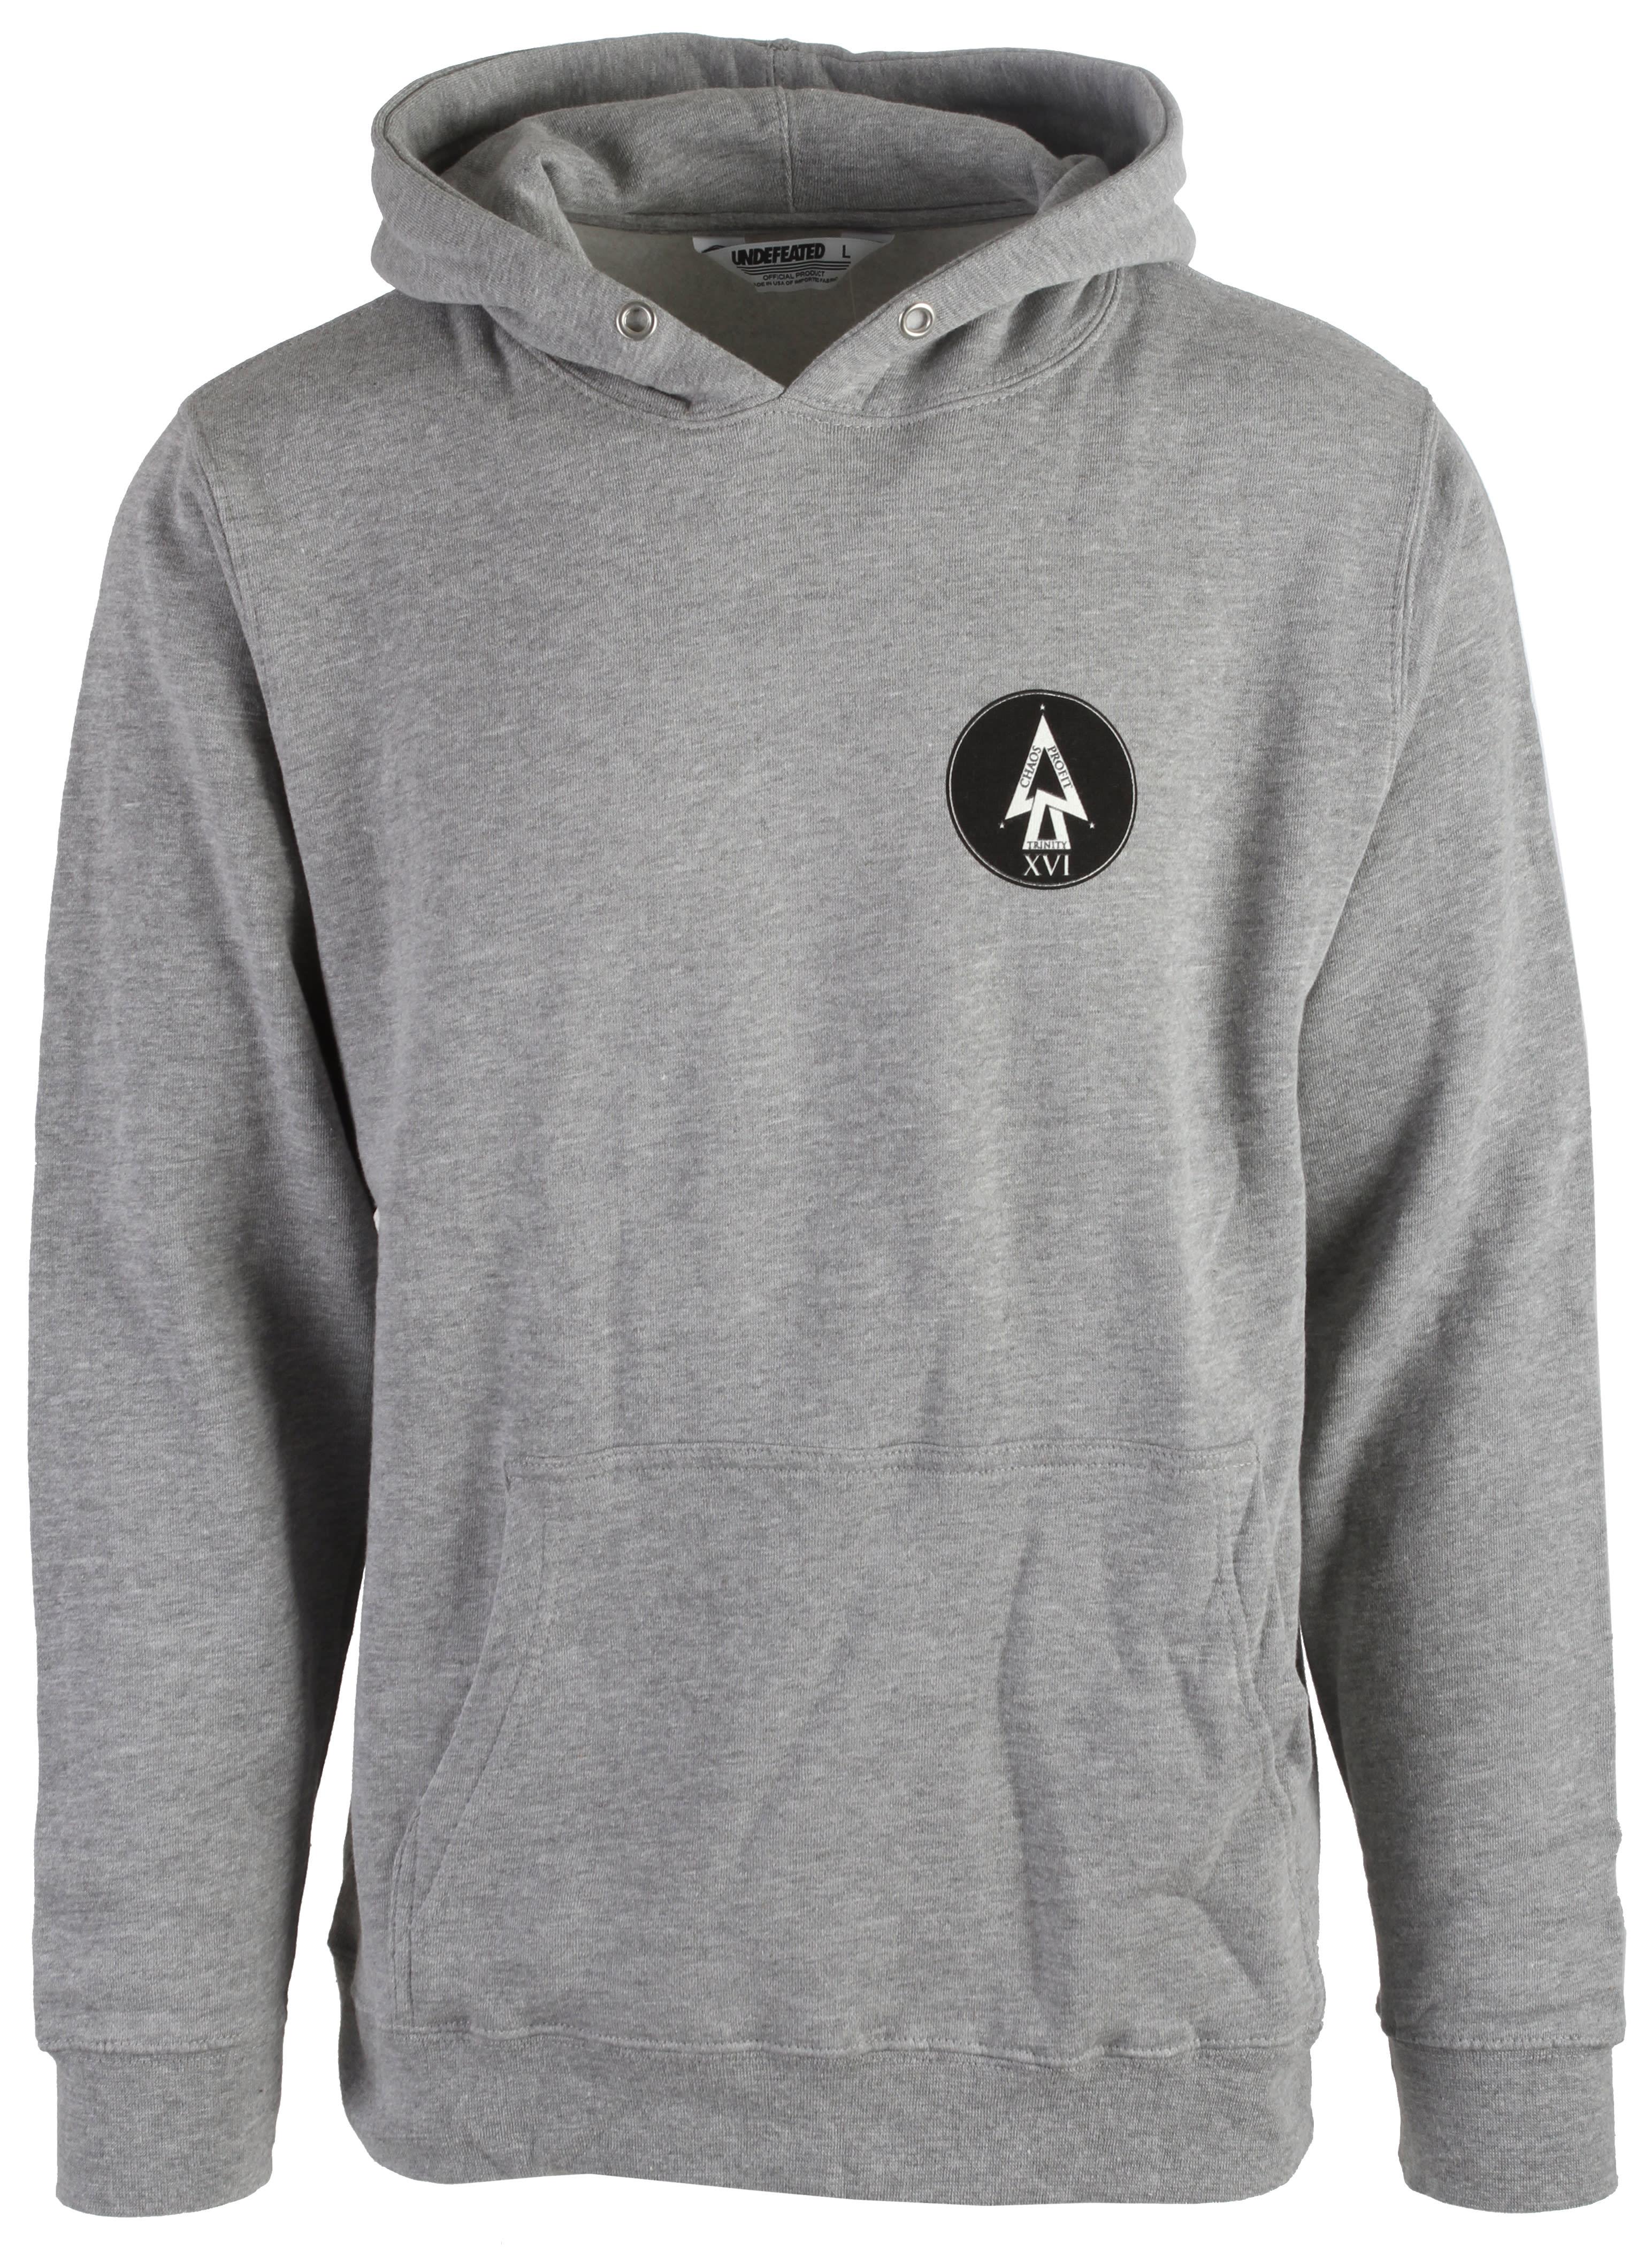 on sale burton undefeated x alpha industries xbone hoodie. Black Bedroom Furniture Sets. Home Design Ideas